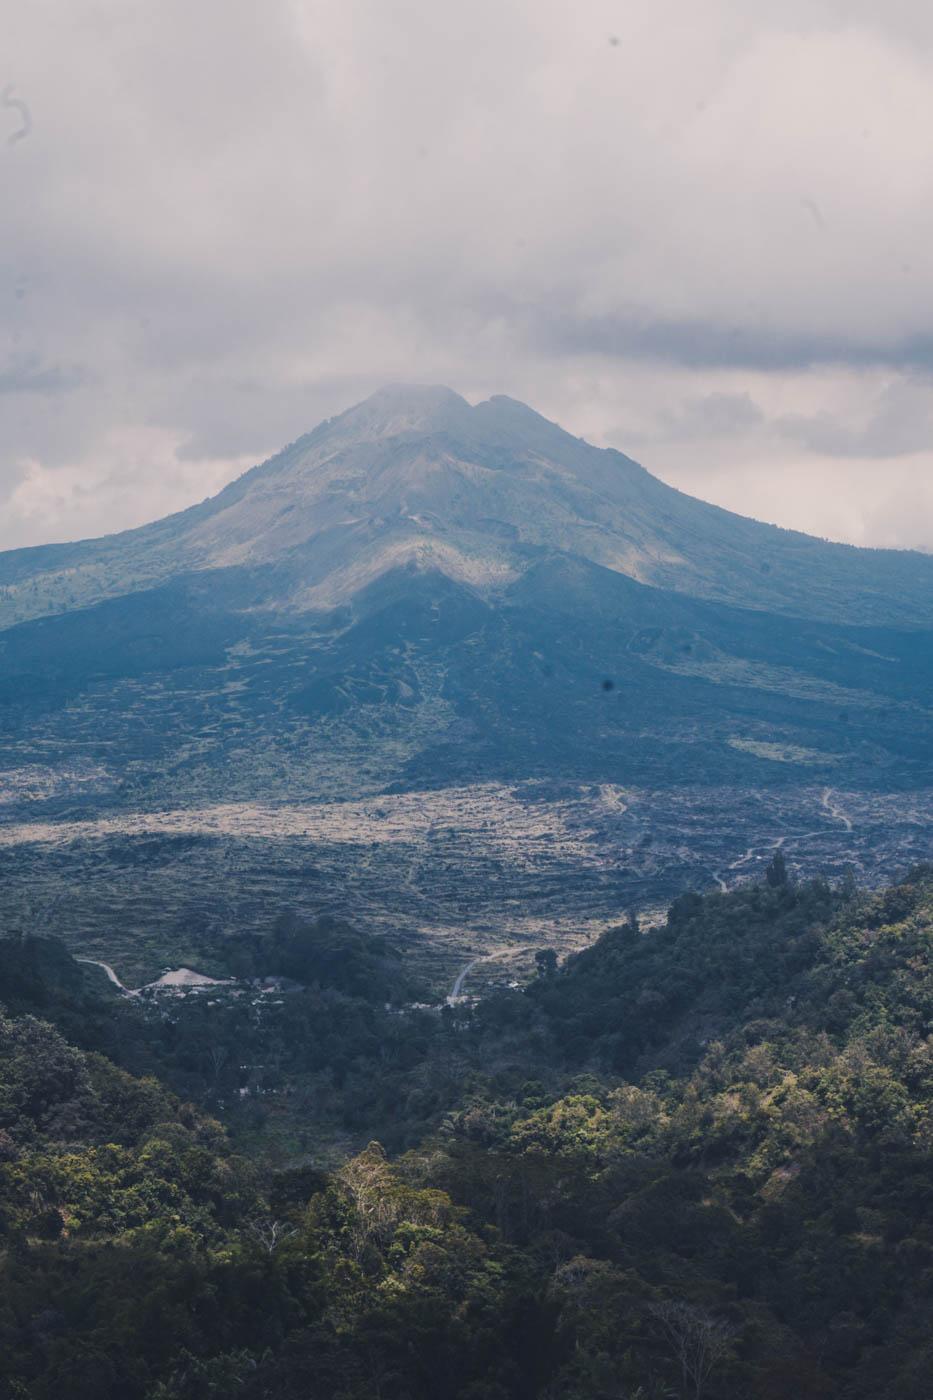 Mount Batur - Bali Itinerary #traveldestinations #bali #beautifulplaces